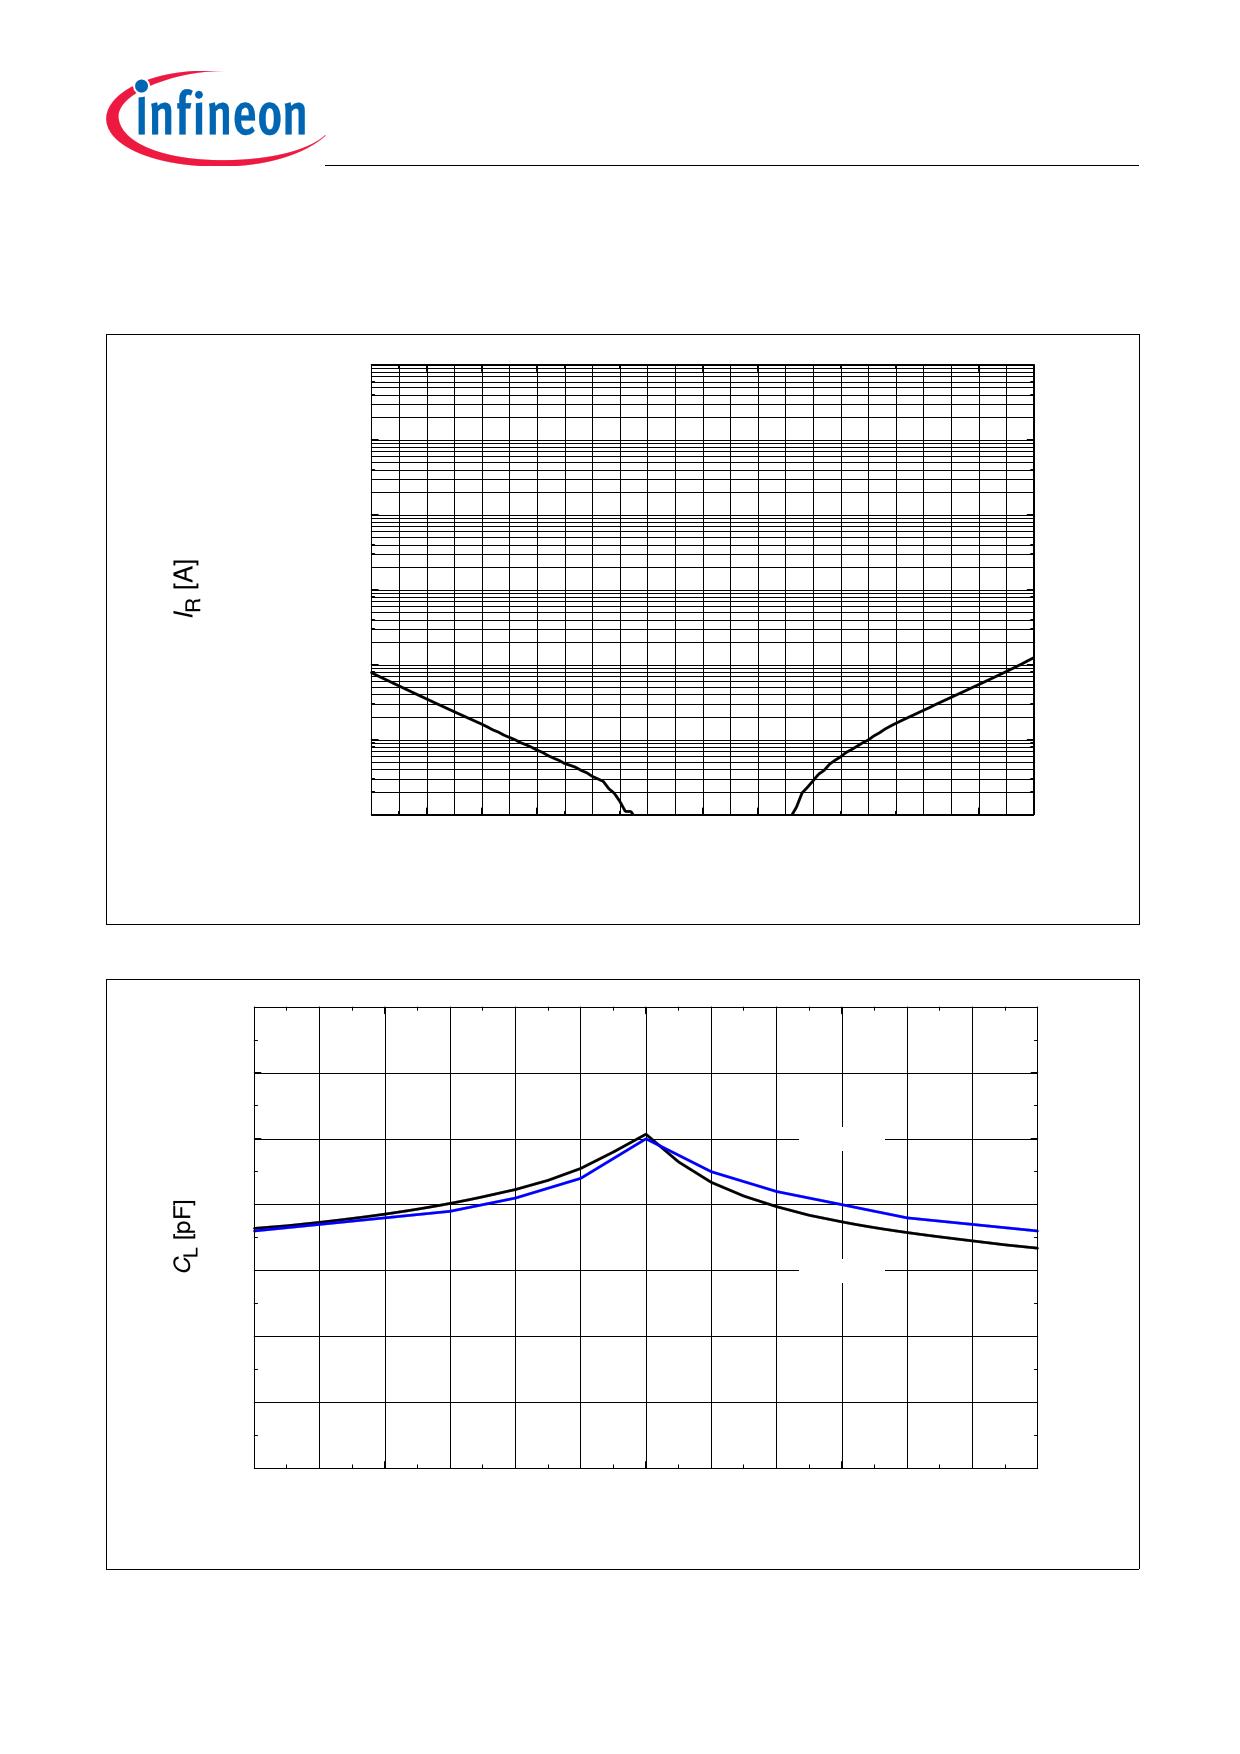 ESD205-B1 電子部品, 半導体